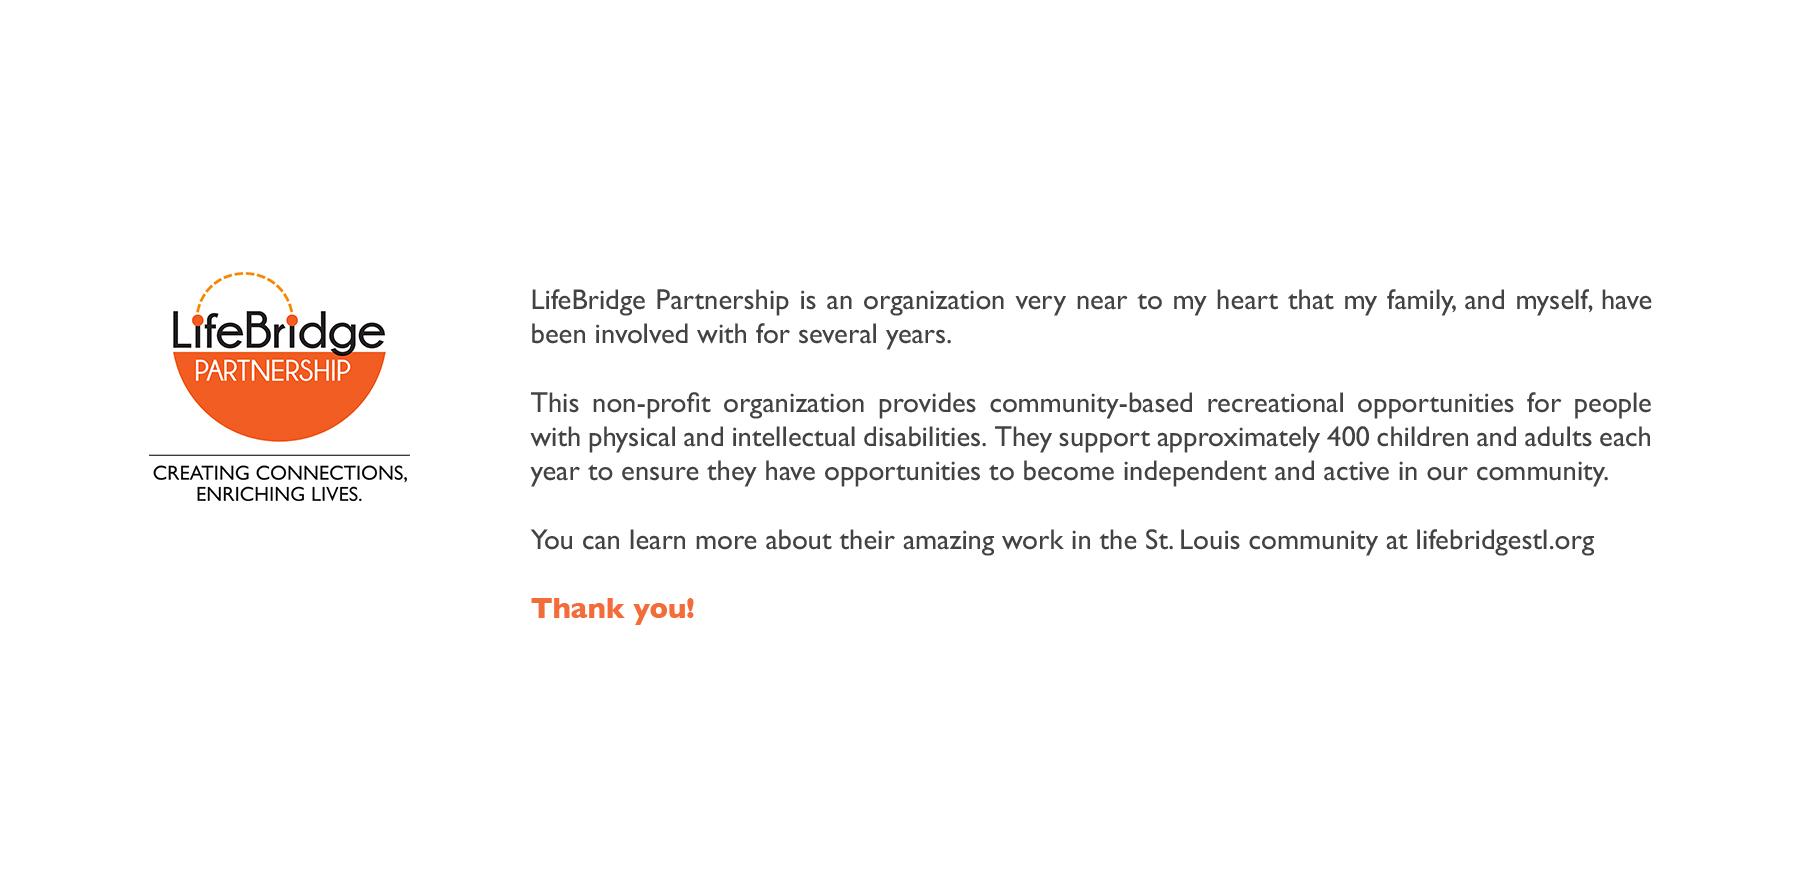 LifeBridge Partnership Thank You.jpg